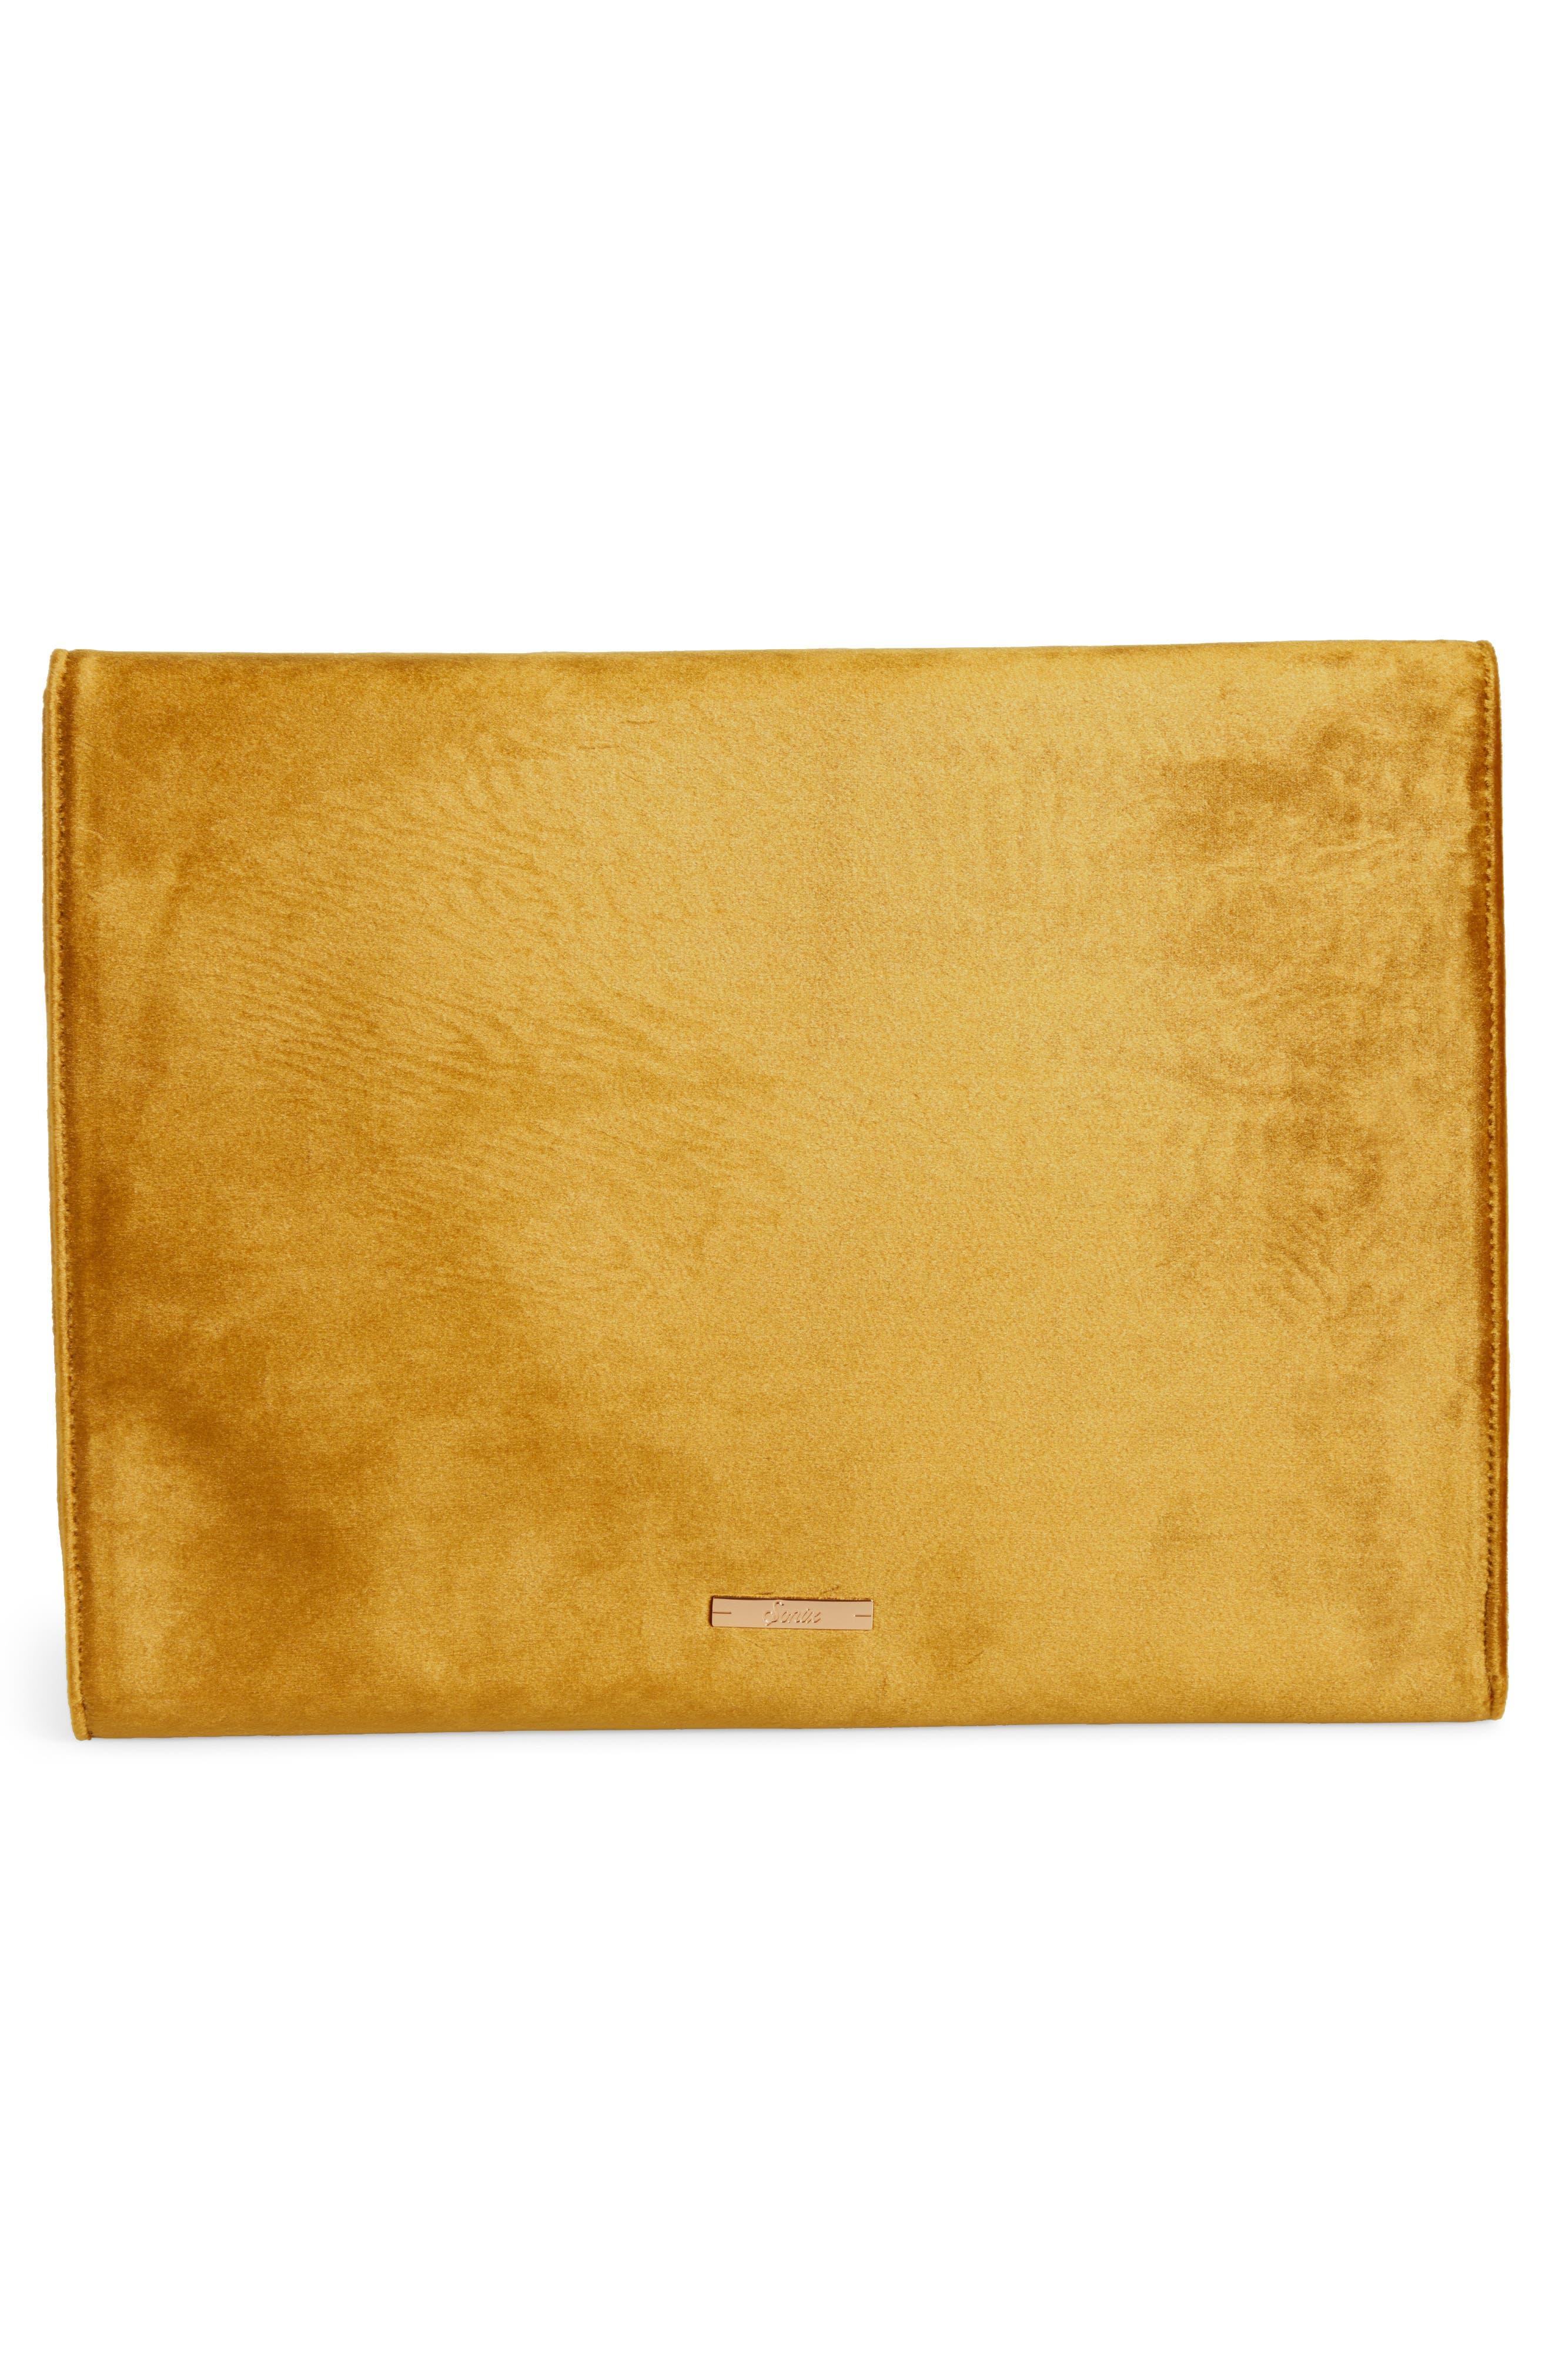 Canary Velvet Laptop Clutch,                             Alternate thumbnail 2, color,                             Gold